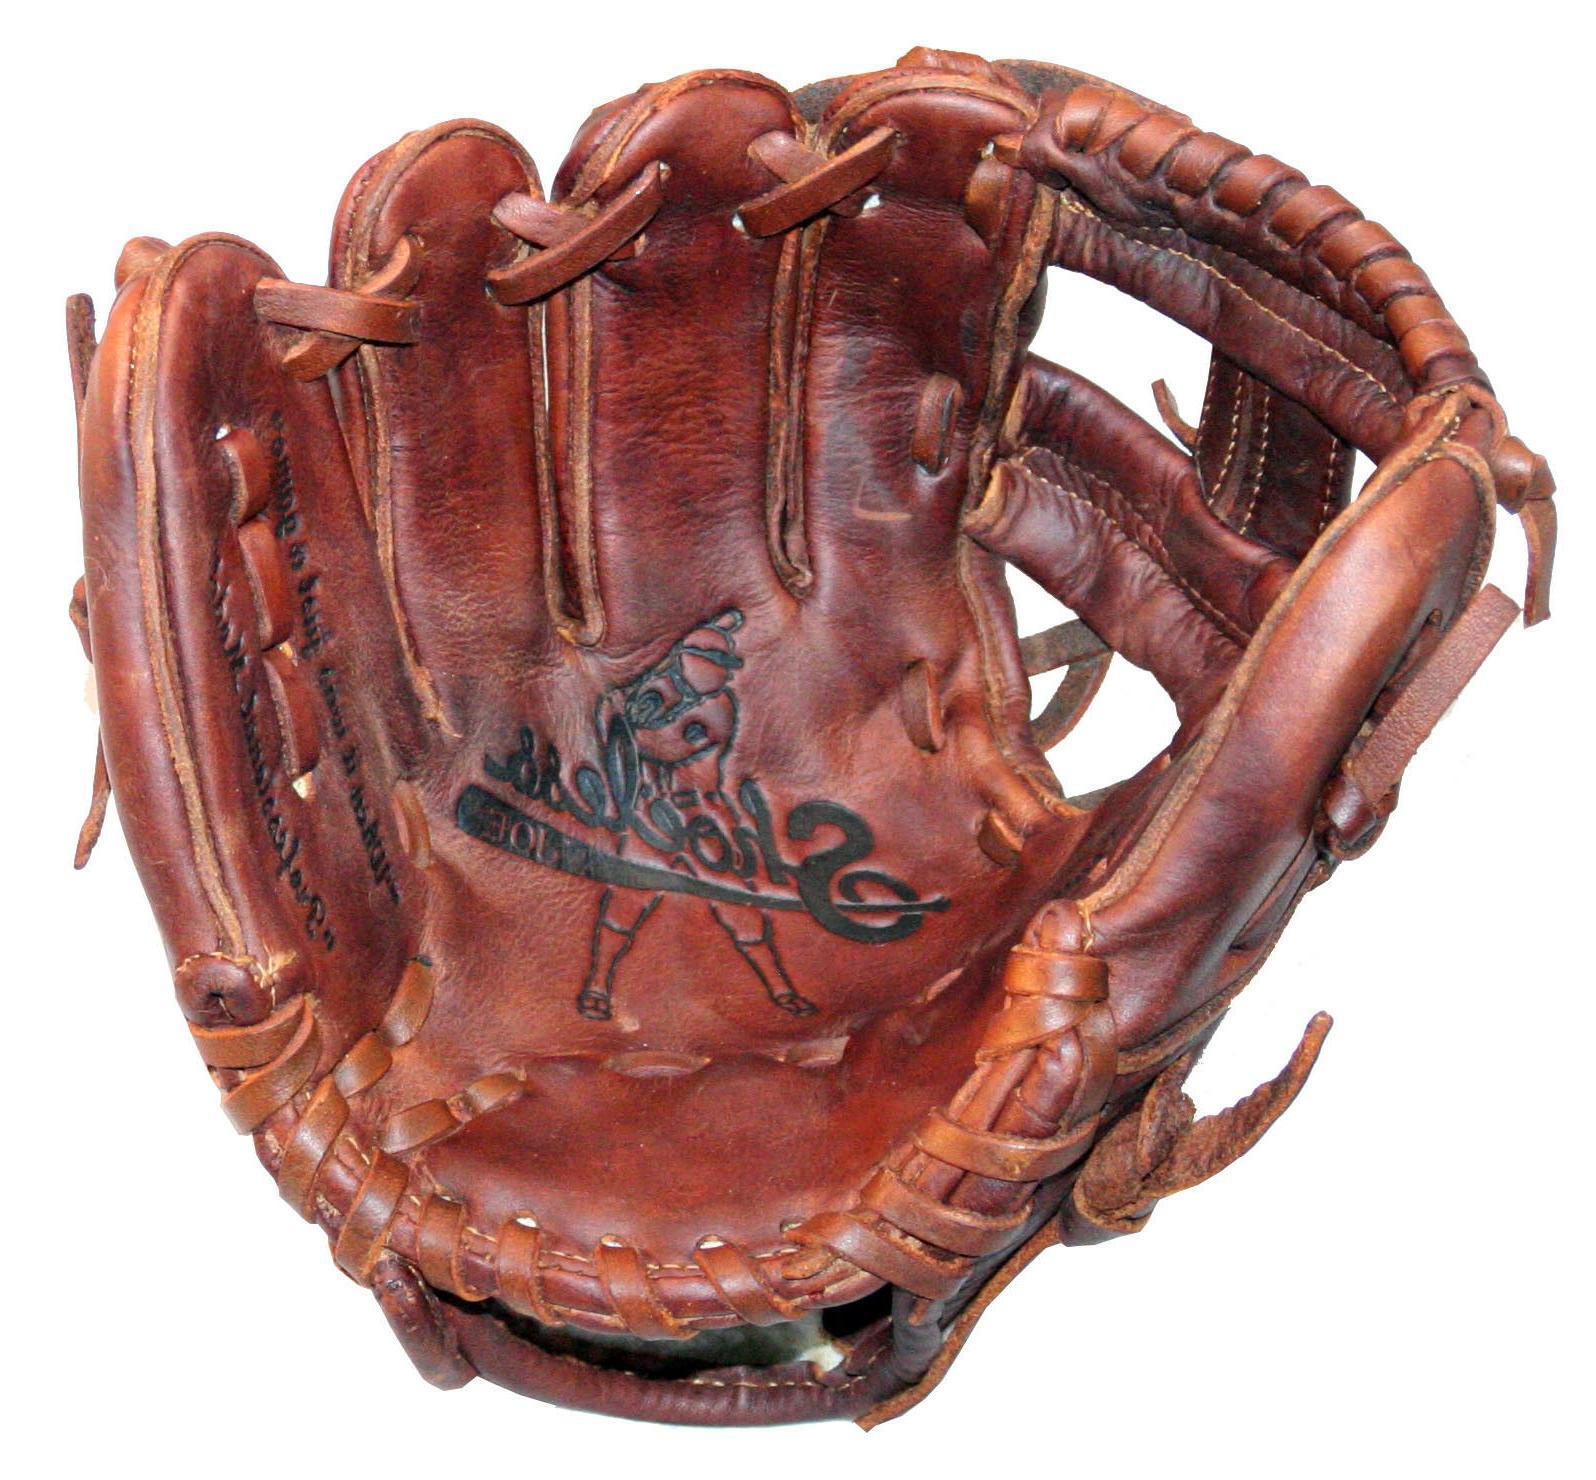 9 junior baseball glove